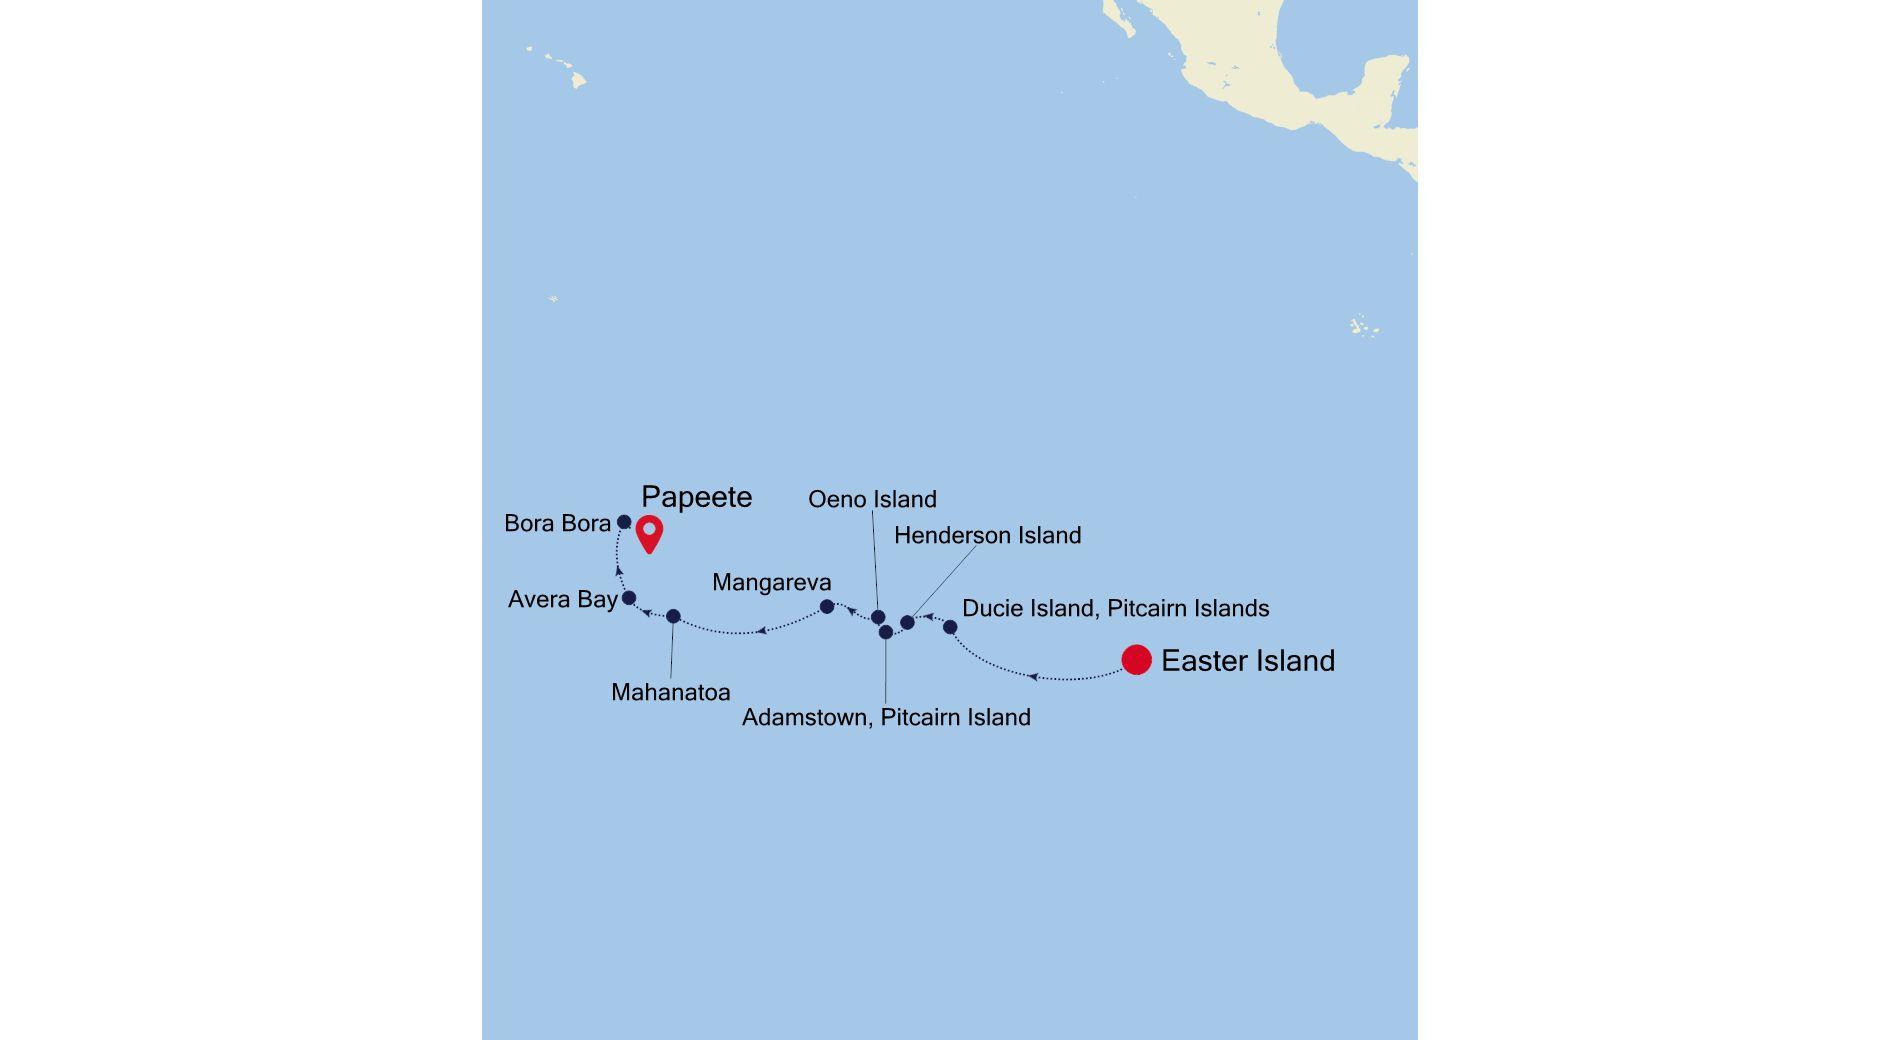 7906 - Easter Island a Papeete